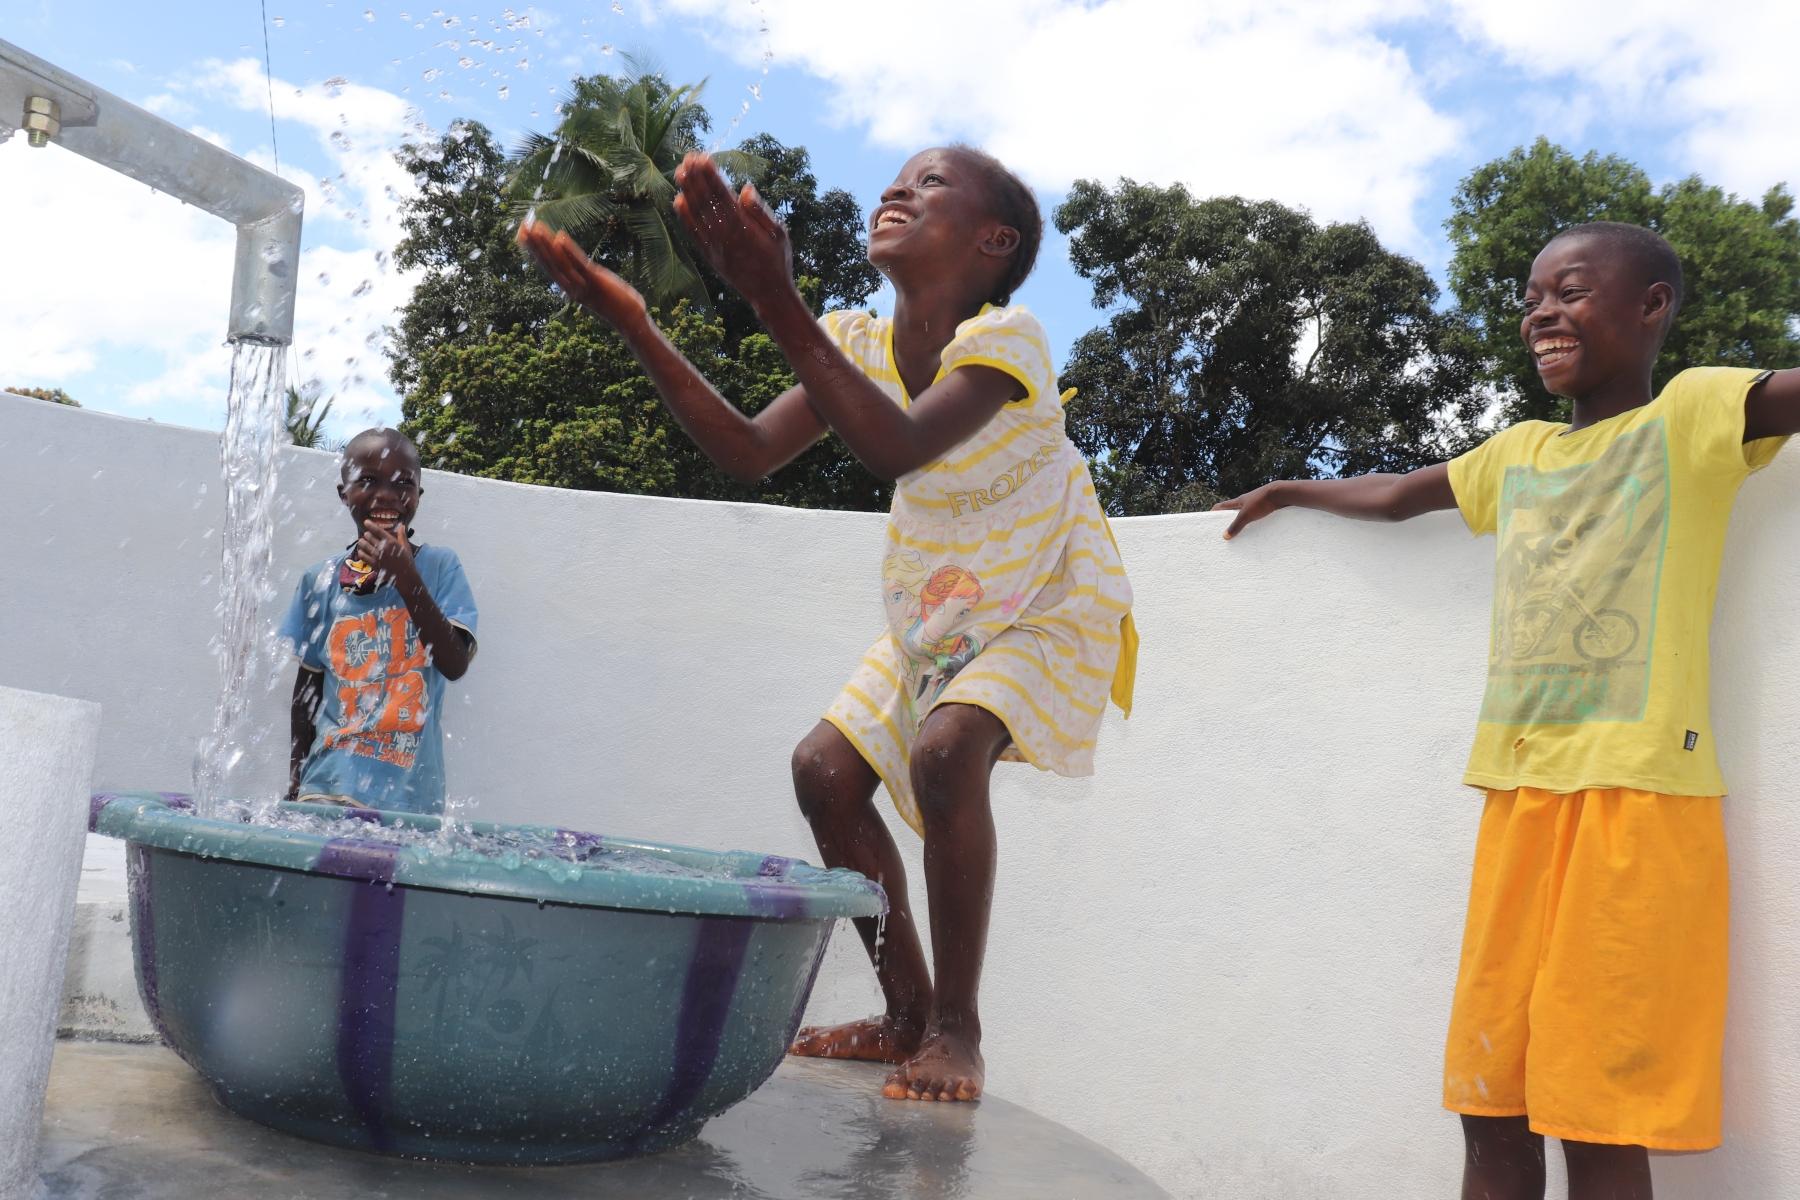 The Water Project : sierraleone20427-kids-celebrating-and-splashing-1